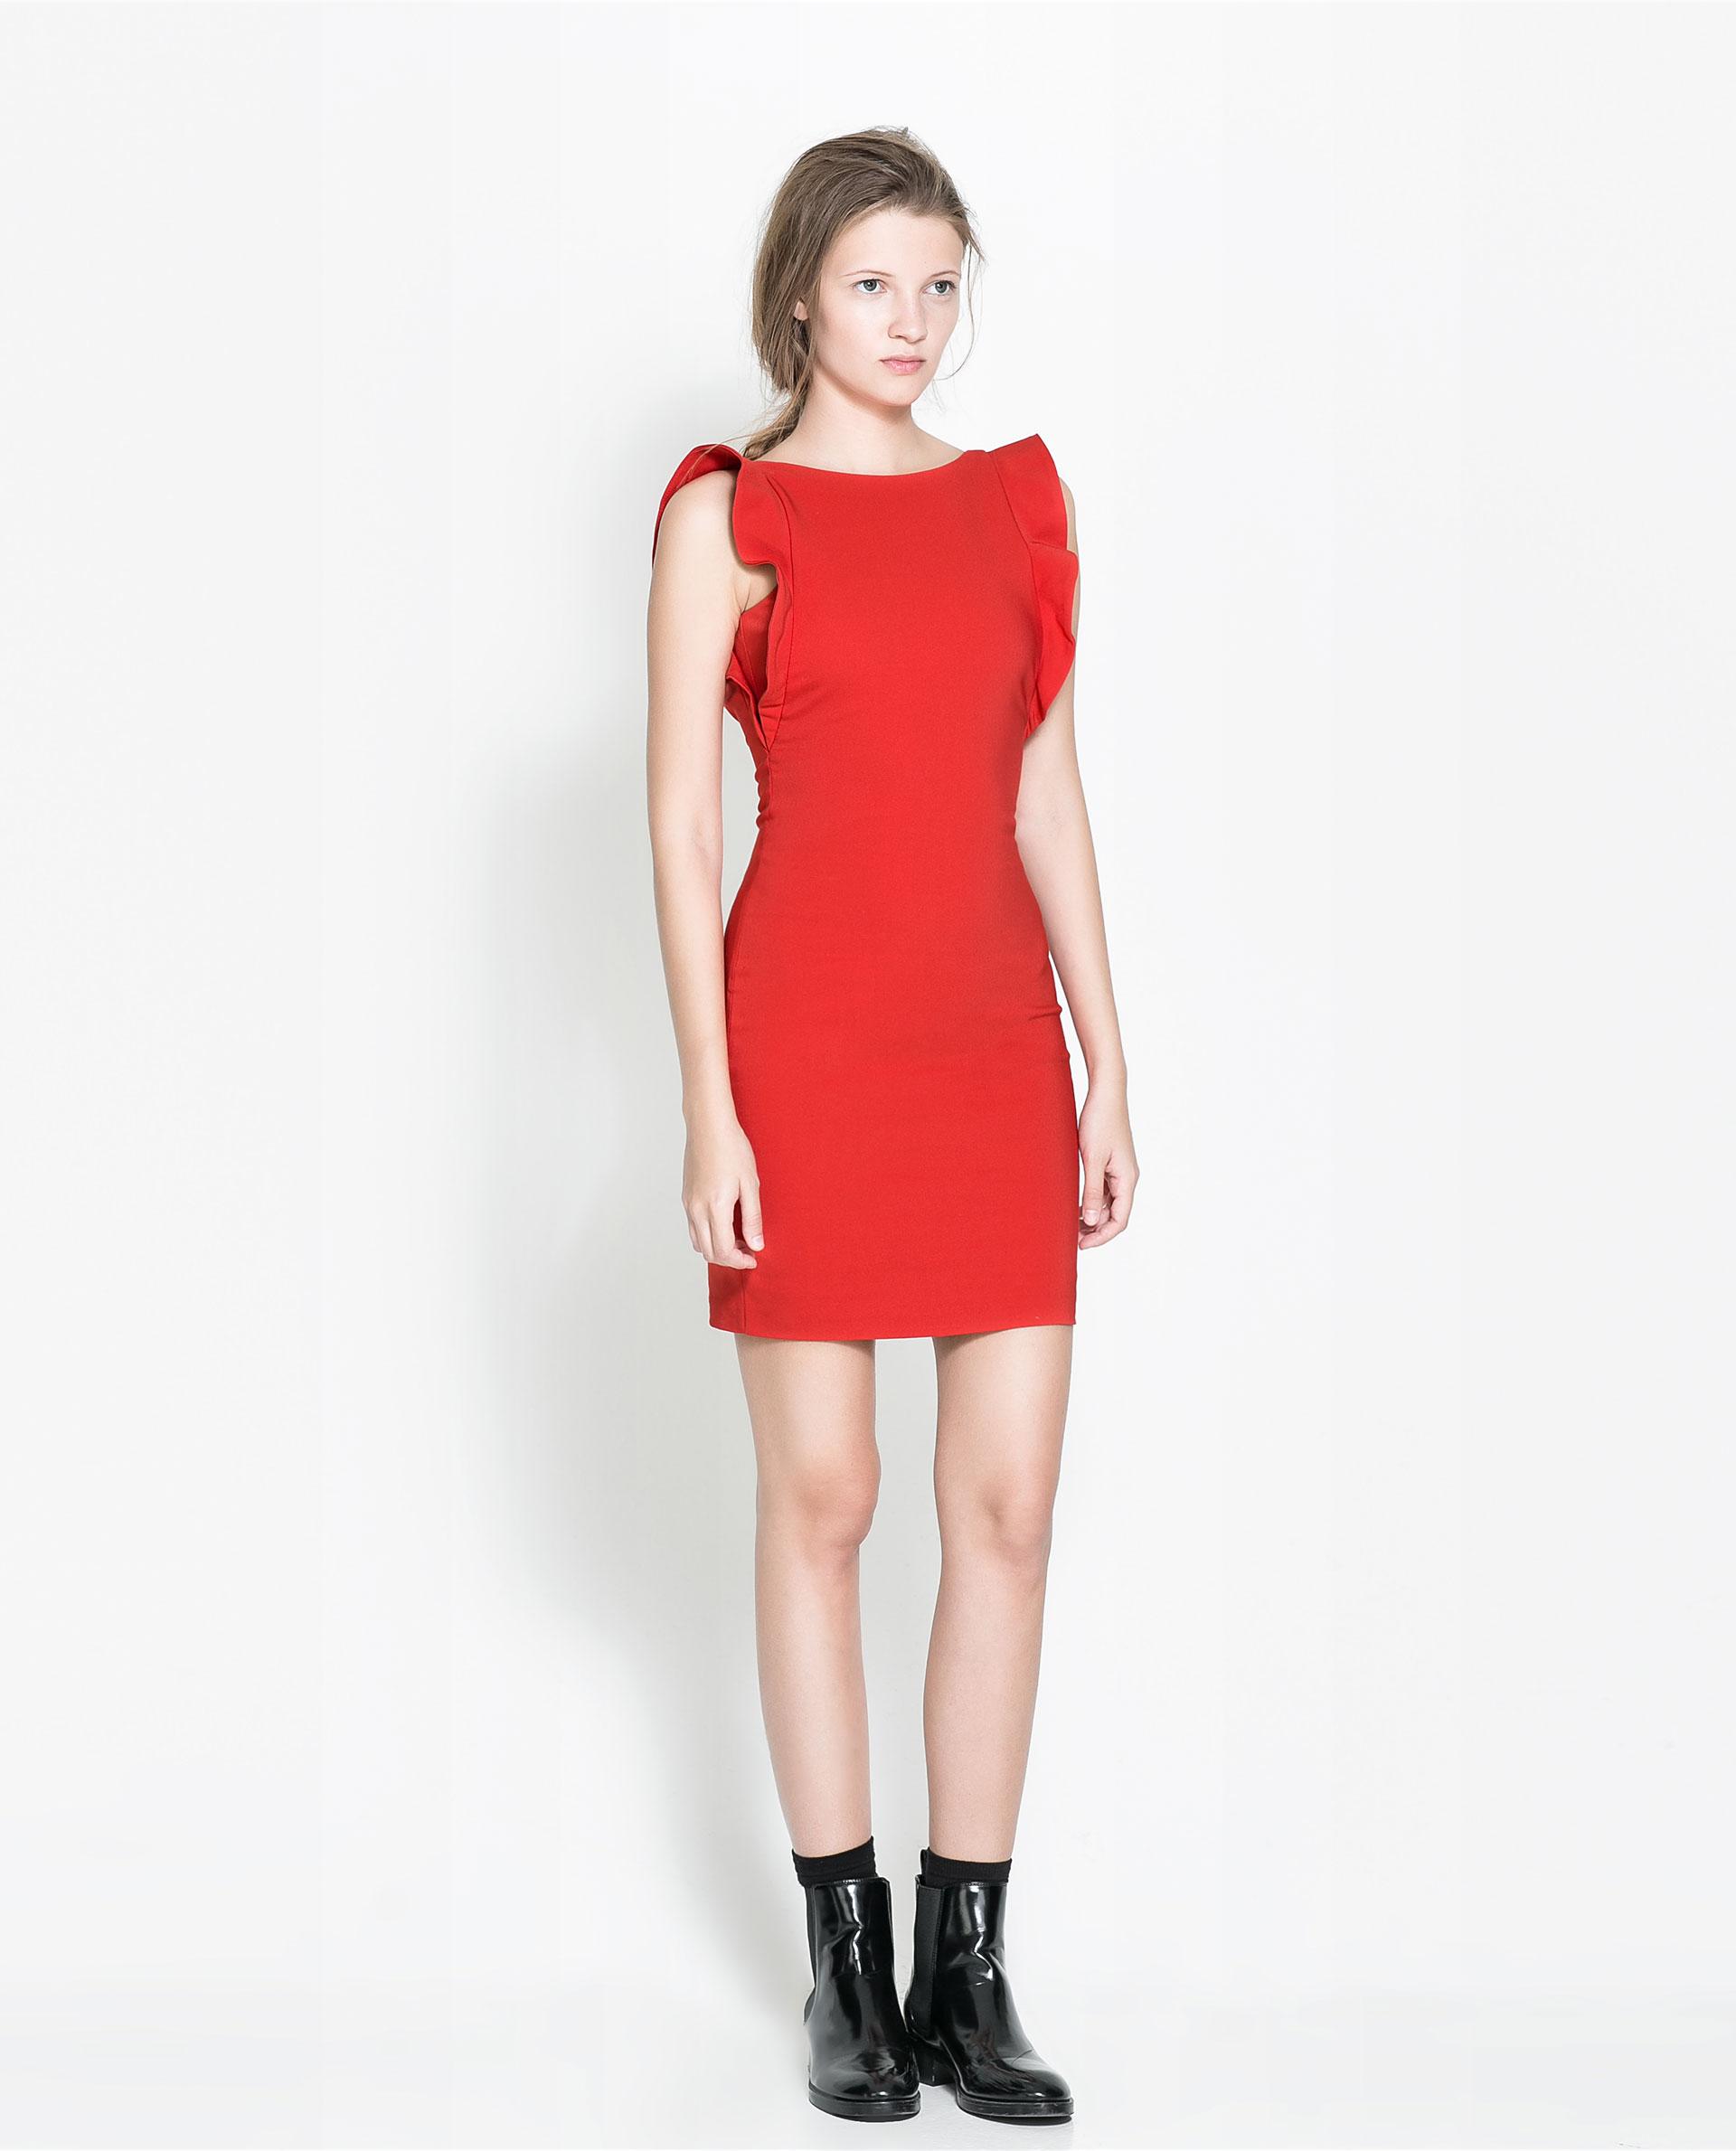 Zara Sleeveless Tube Dress with Ruffles in Red - Lyst